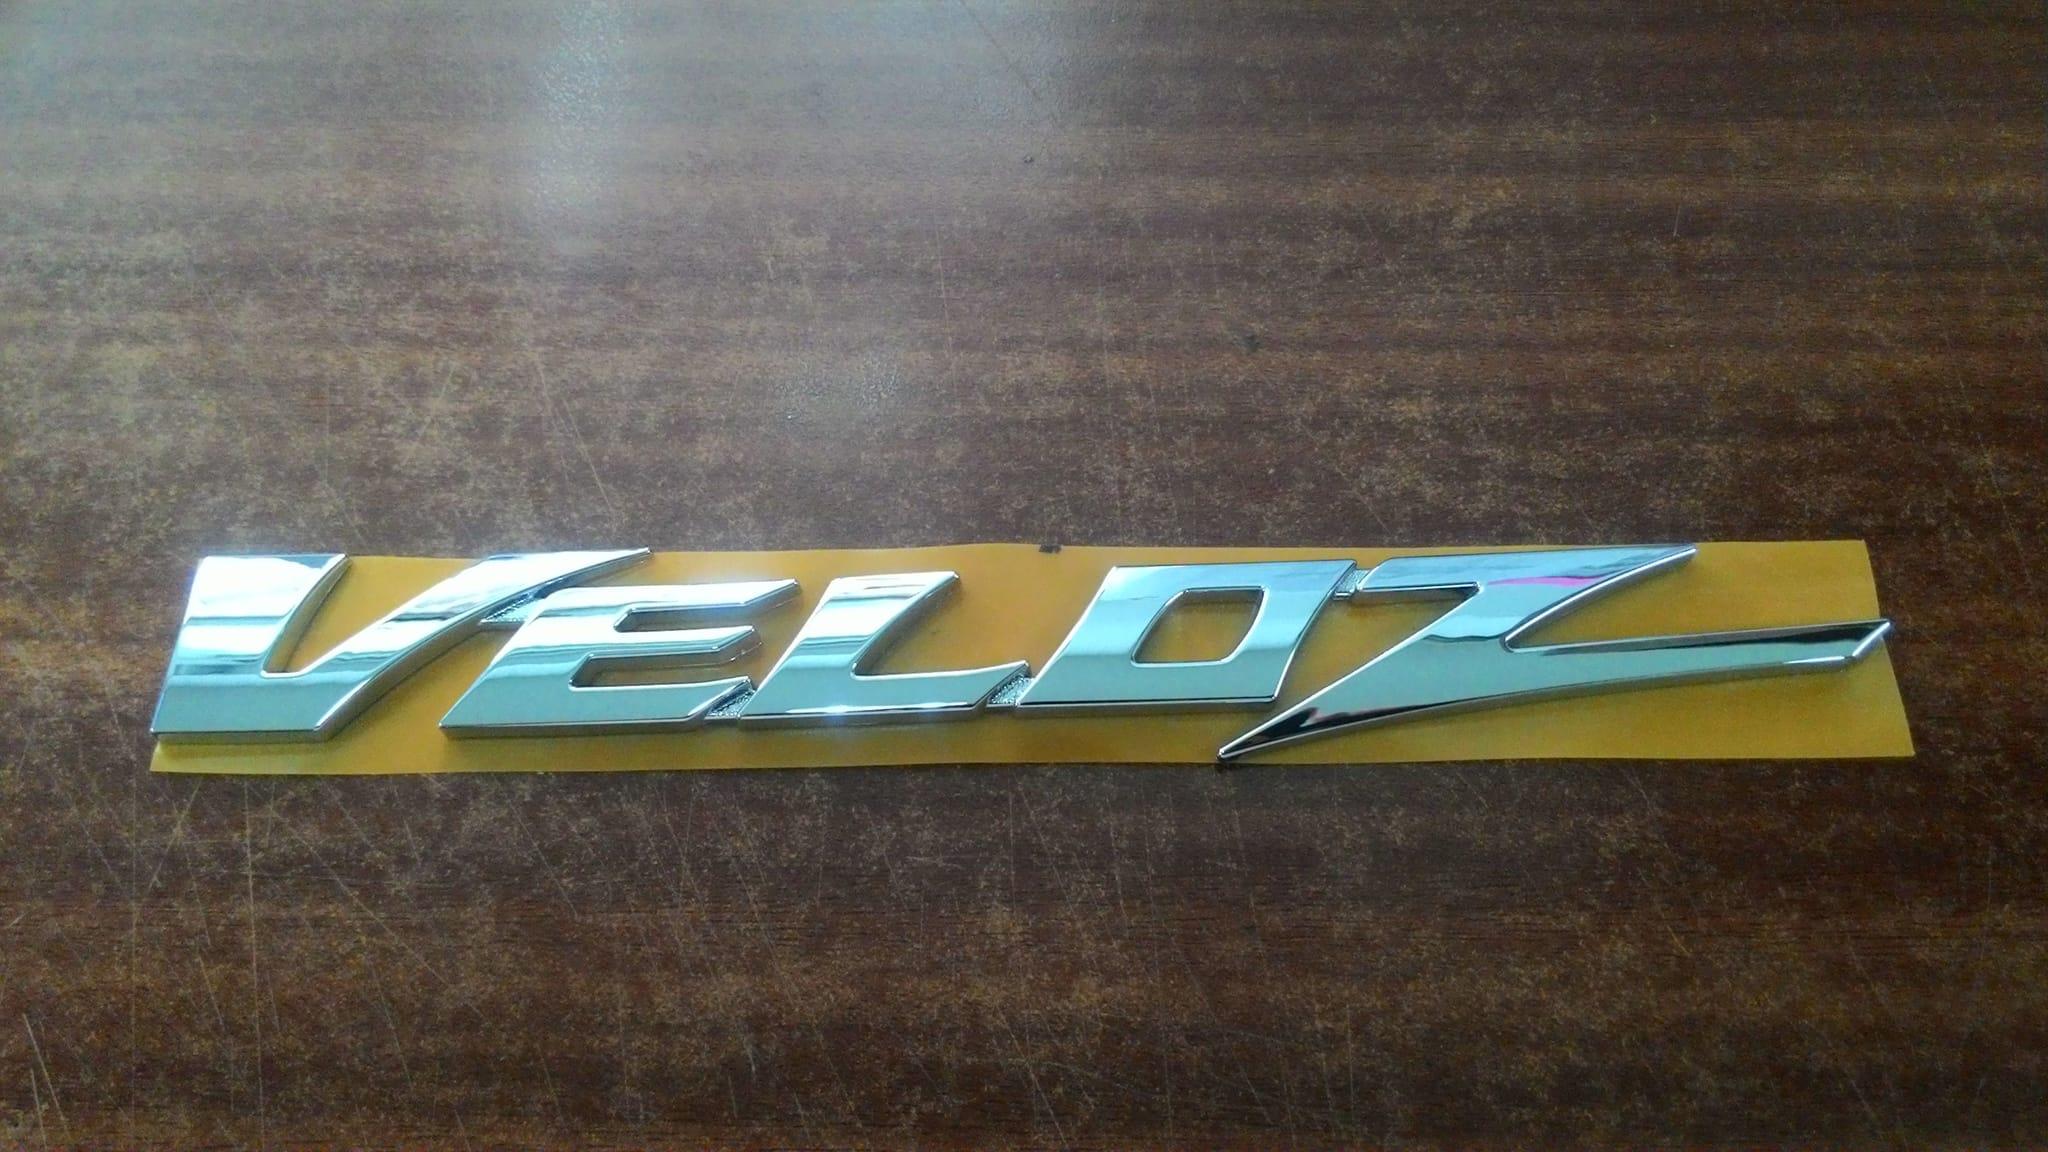 logo grand new avanza all kijang innova type v jual emblem veloz original toyota genuine part 2904554 d38033ab 945a 46a2 a384 77e3317d1448 jpg